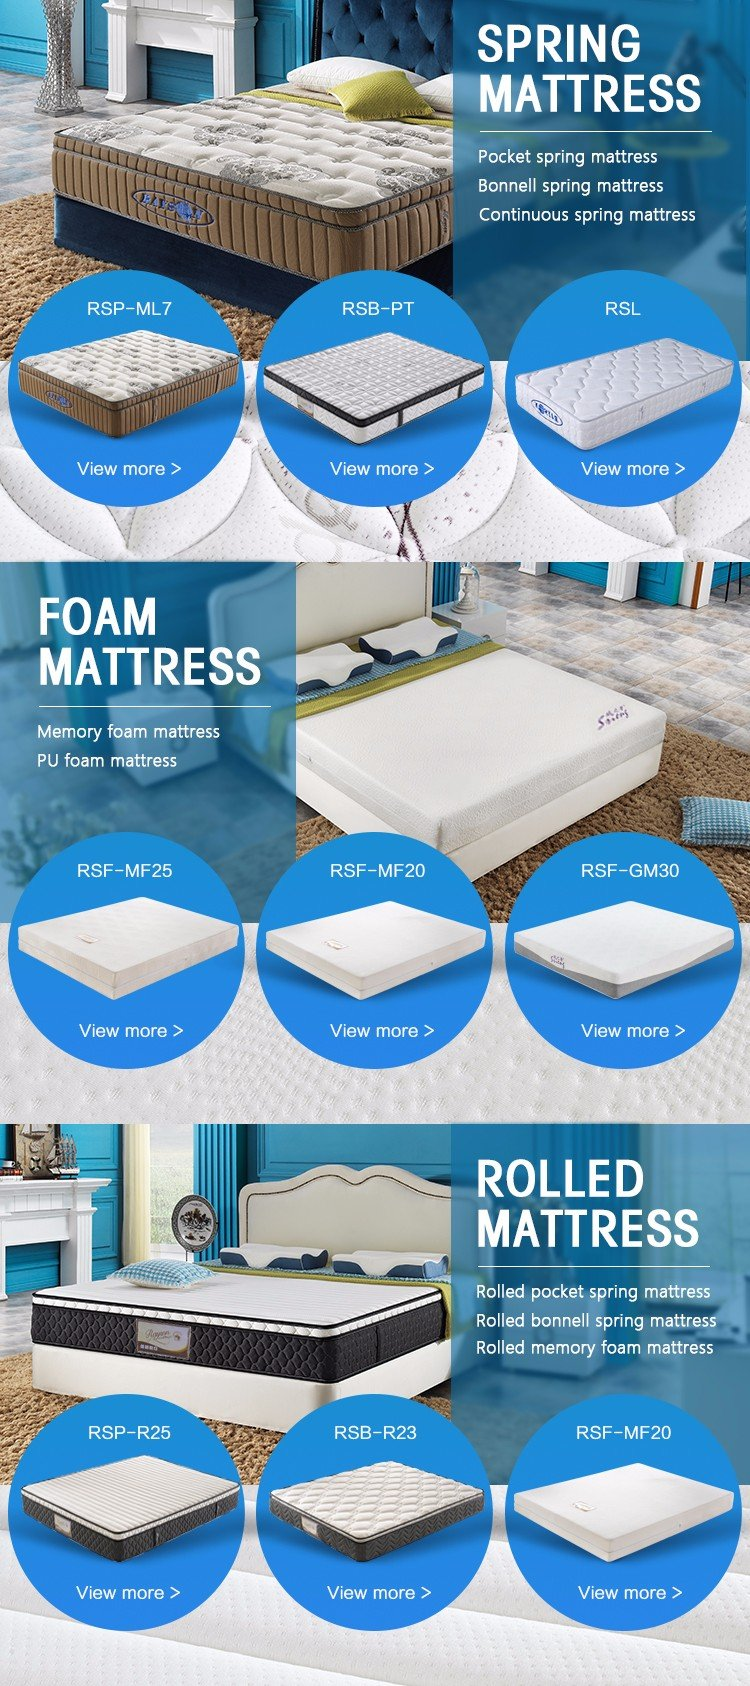 Rayson Mattress comfortable spring mattress review Supply-10